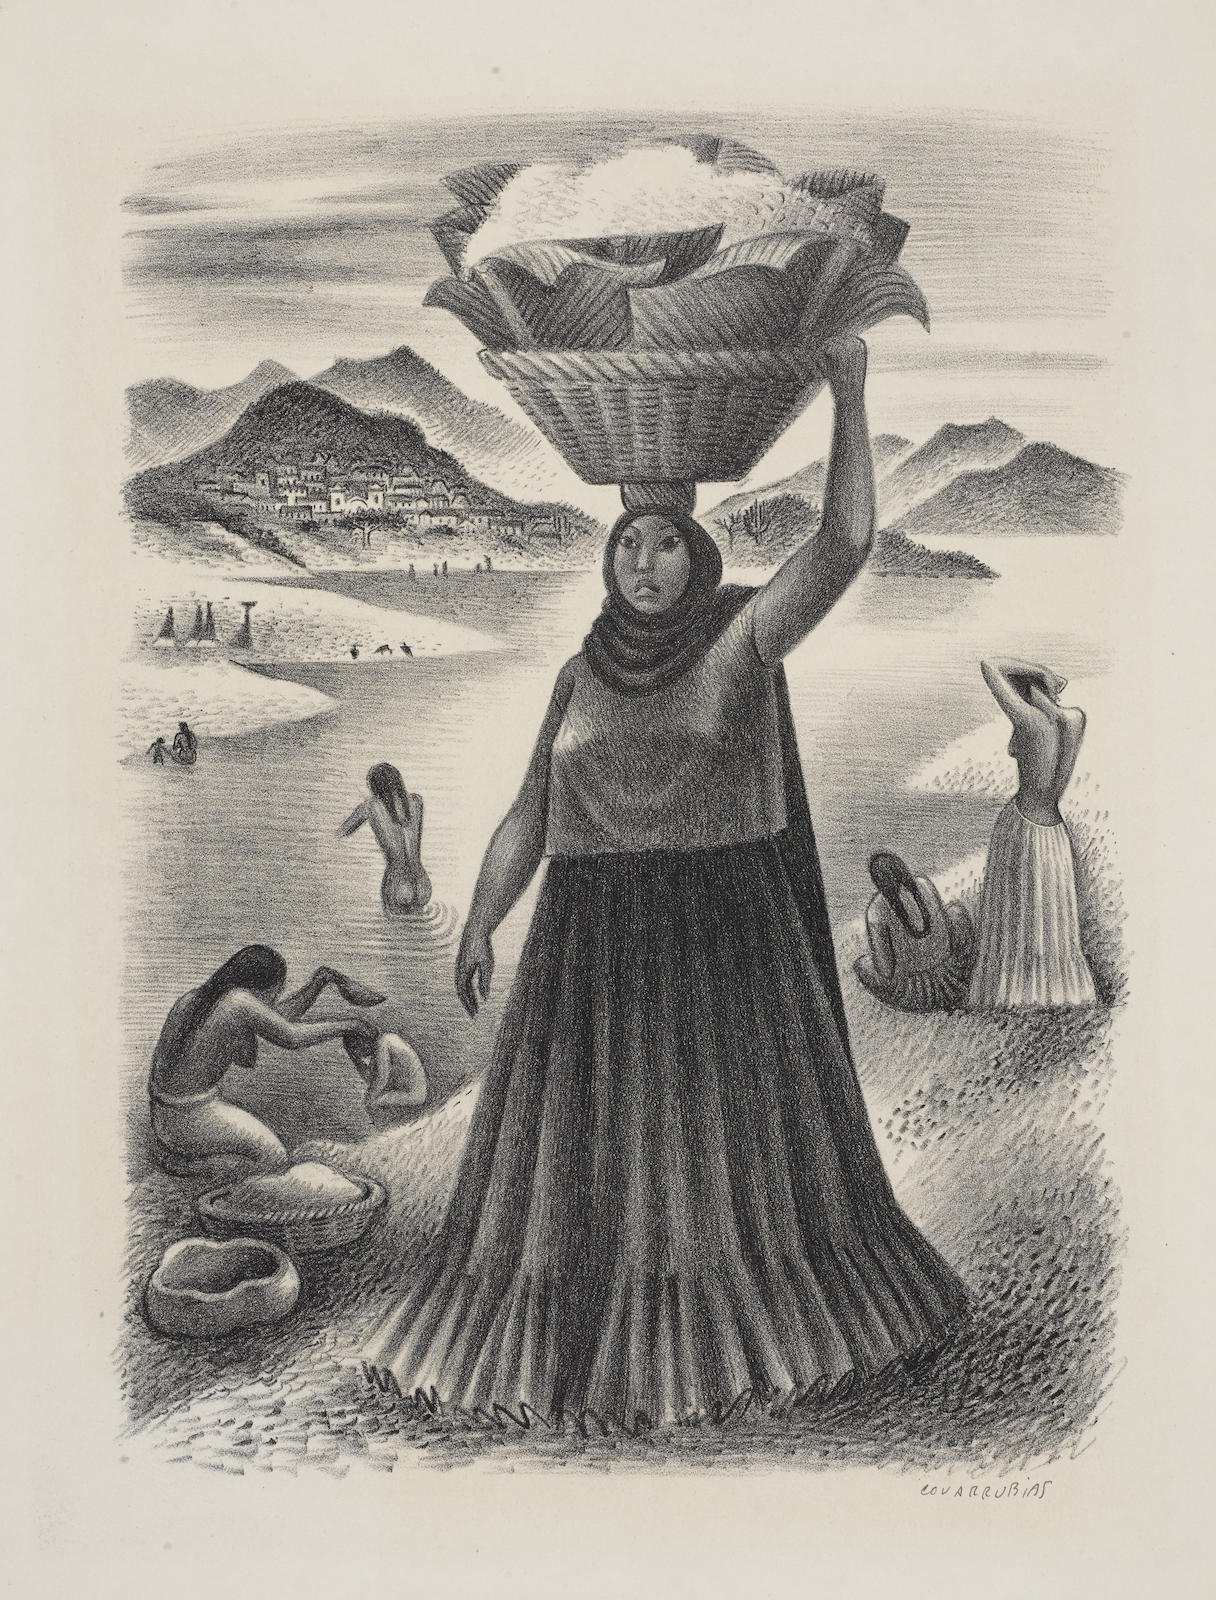 Miguel Covarrubias-Tehauntepec River-1951